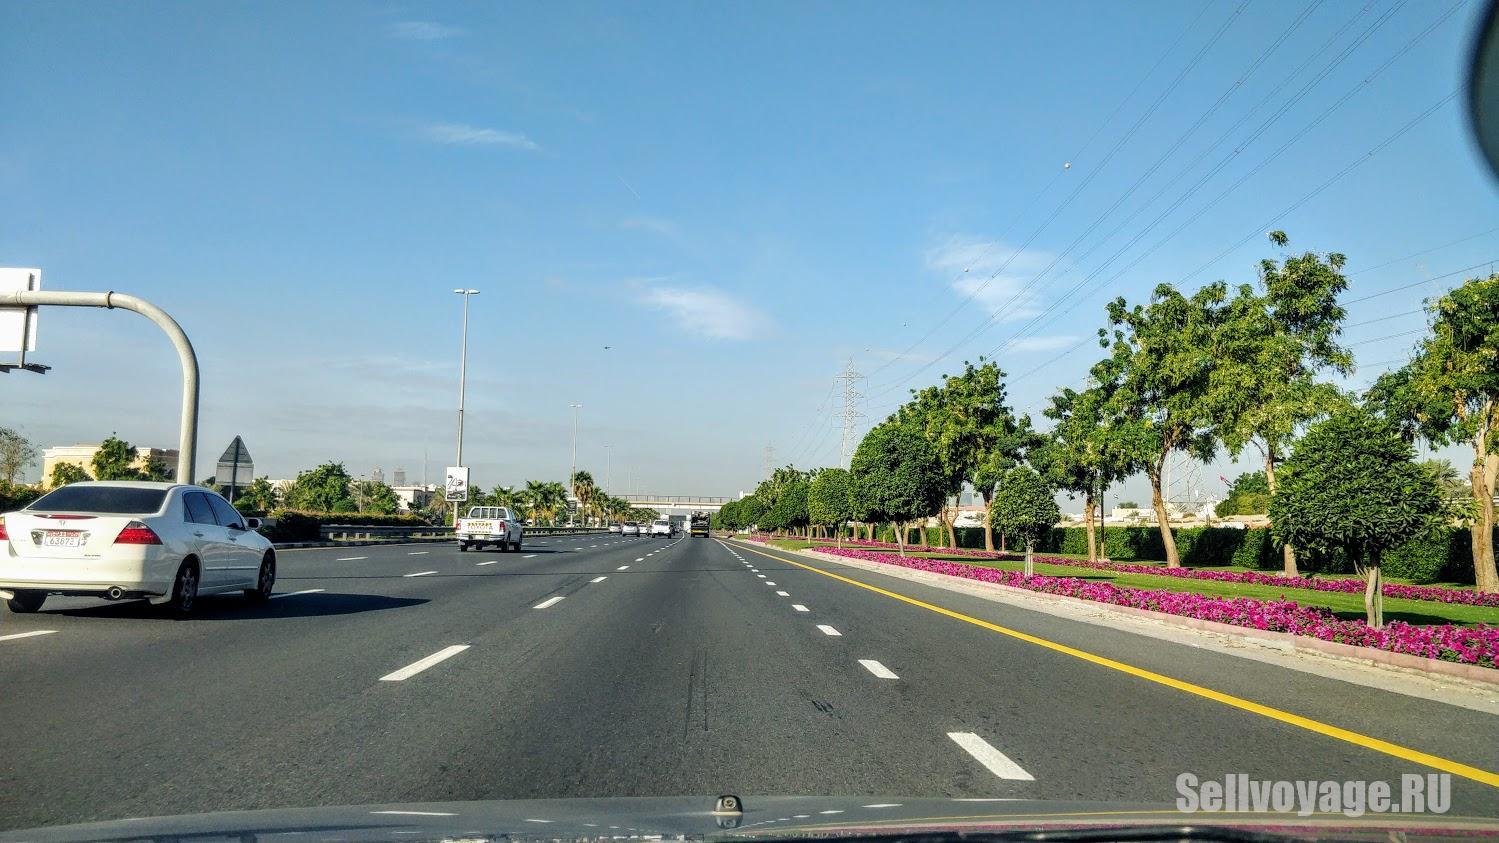 Дубай на арендованном авто. Дорога из аэропорта